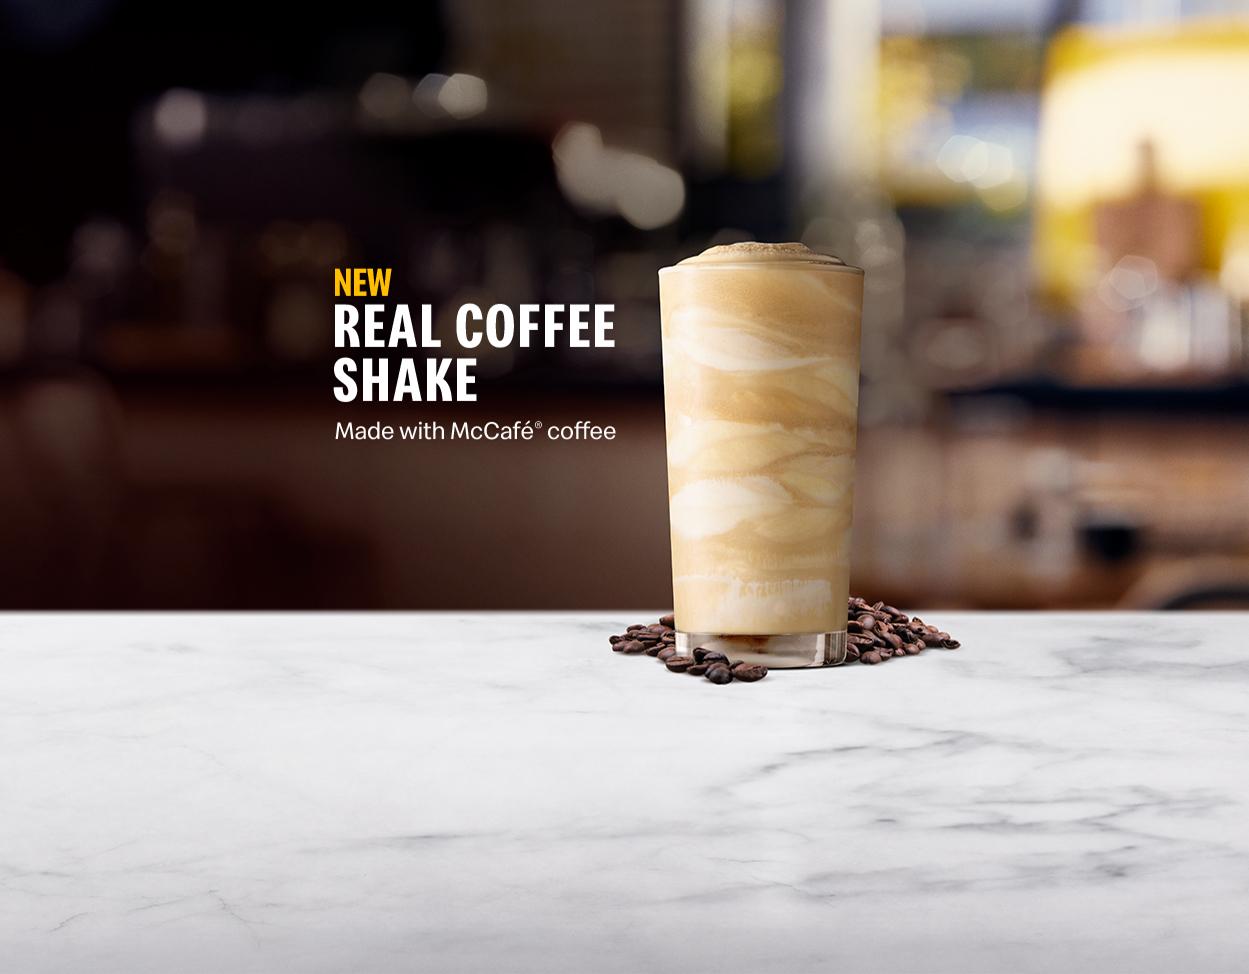 Real Coffee Shake